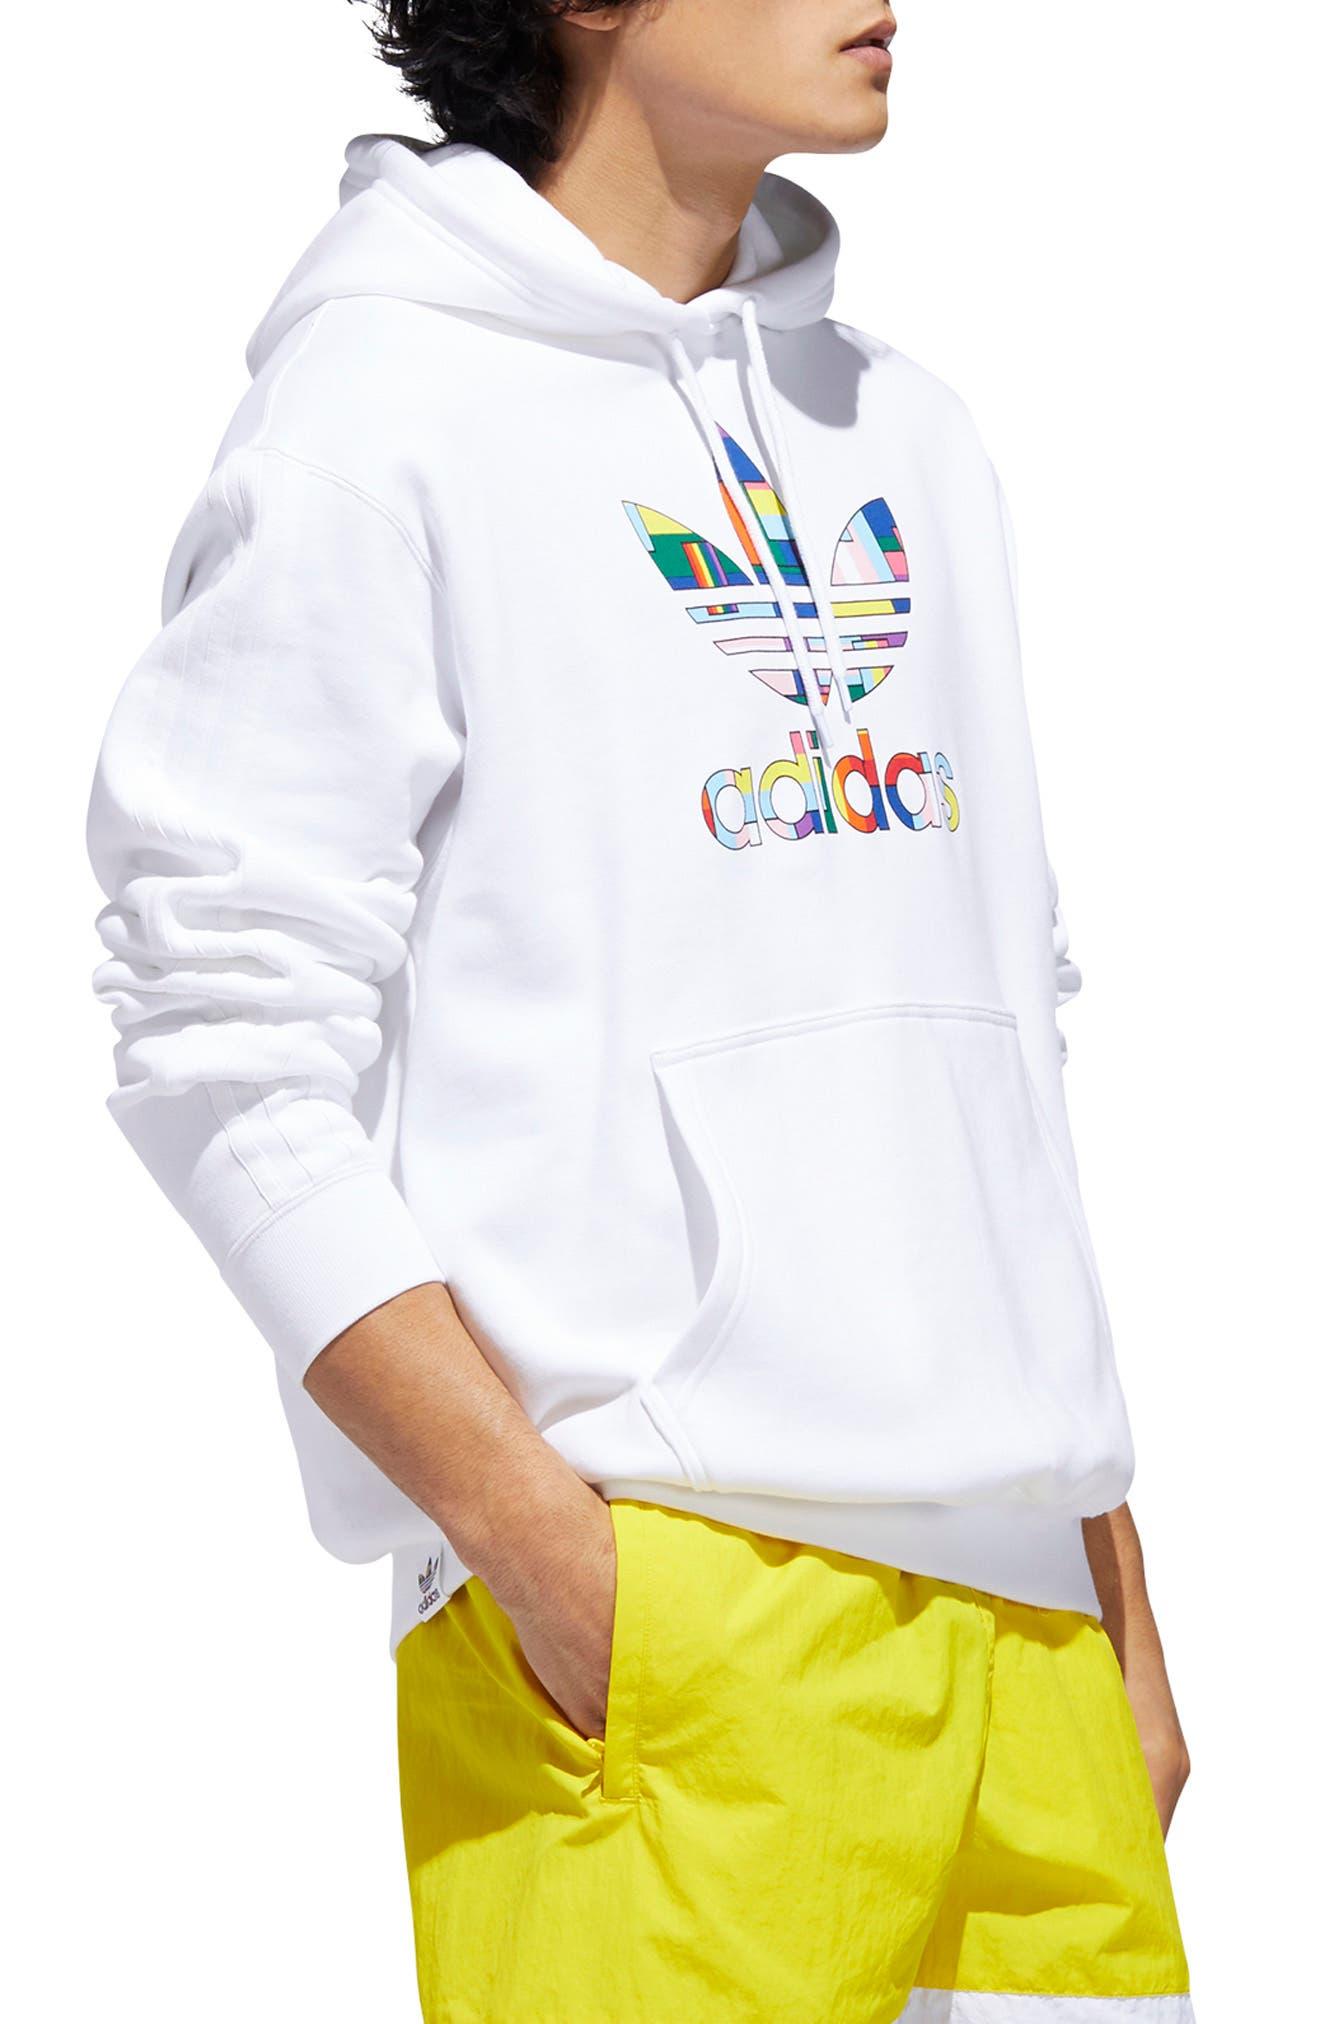 Men's Hooded Hoodies & Sweatshirts | Nordstrom